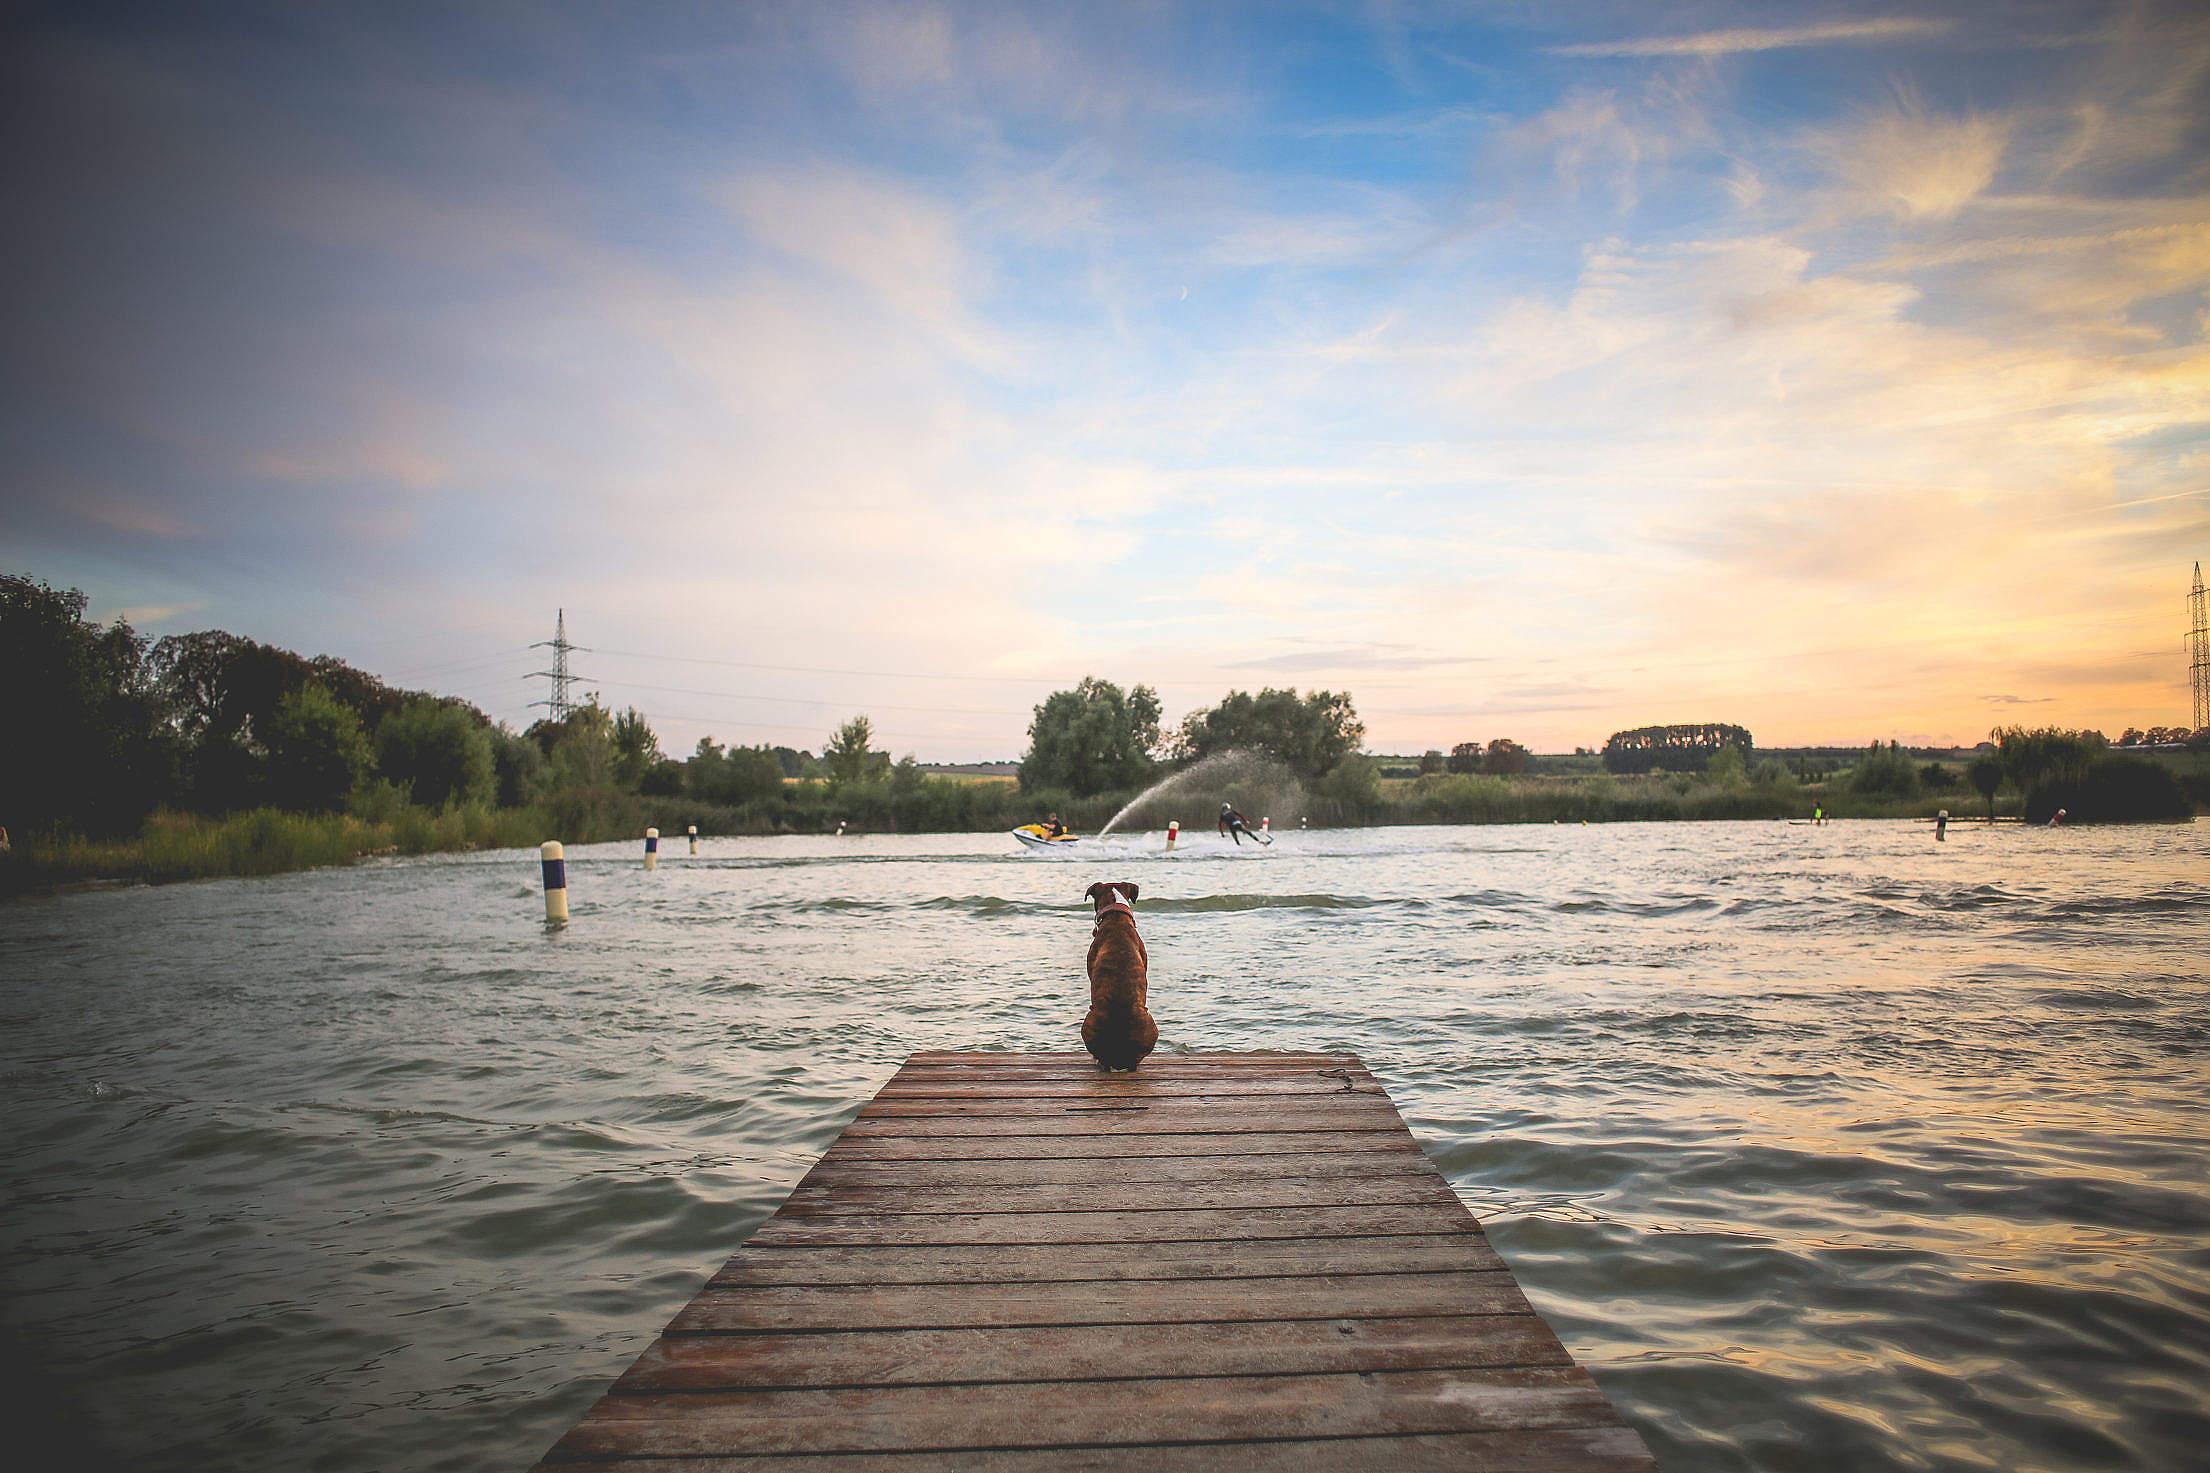 Dog Sitting on a Pier Free Stock Photo